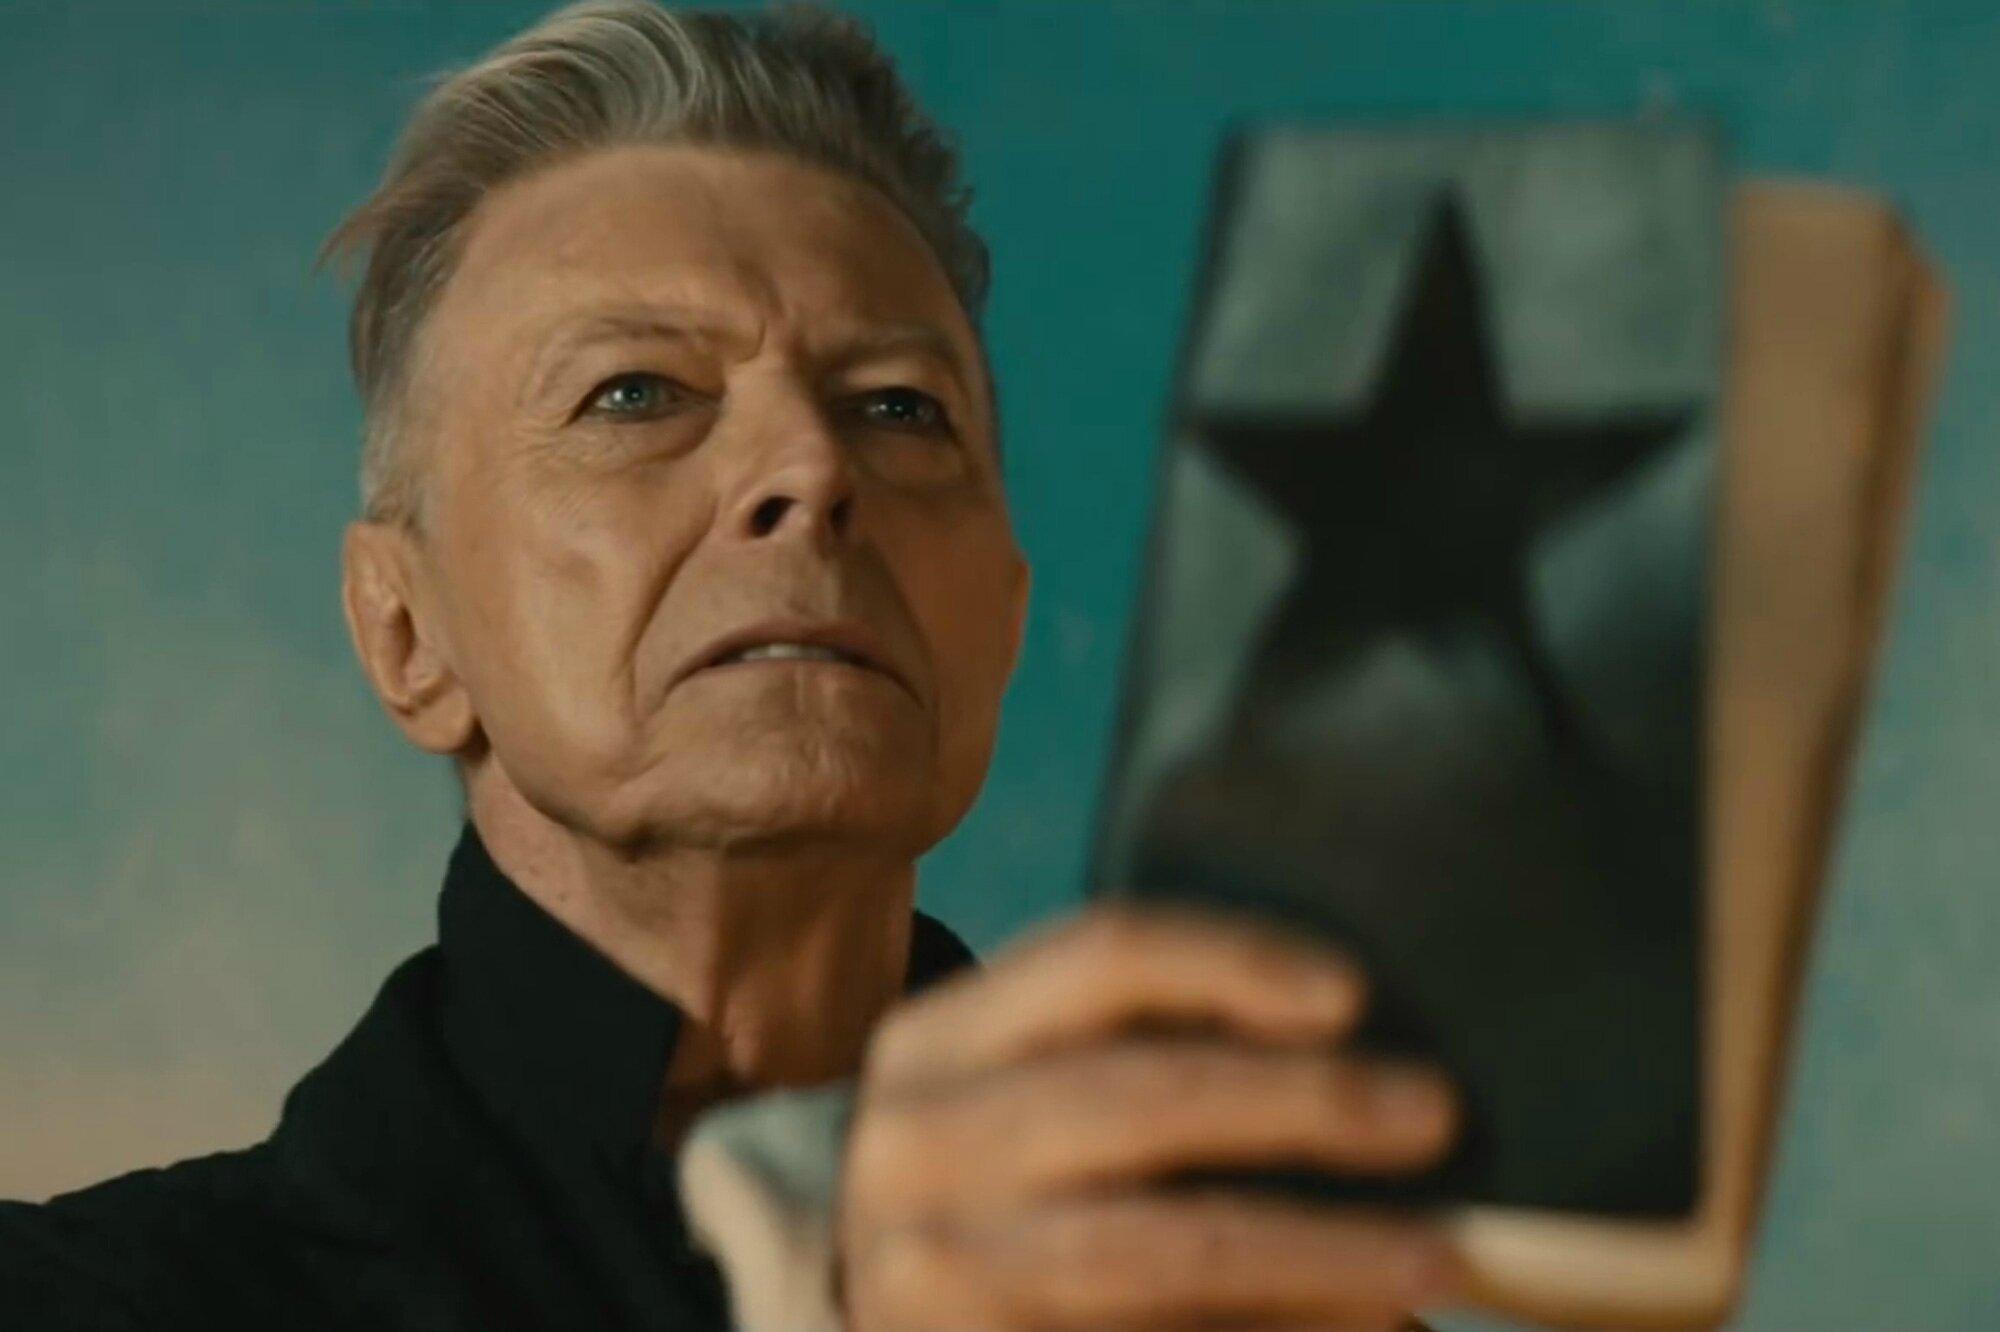 David Bowie Illuminati sacrifice, Antichrist Blackstar Album